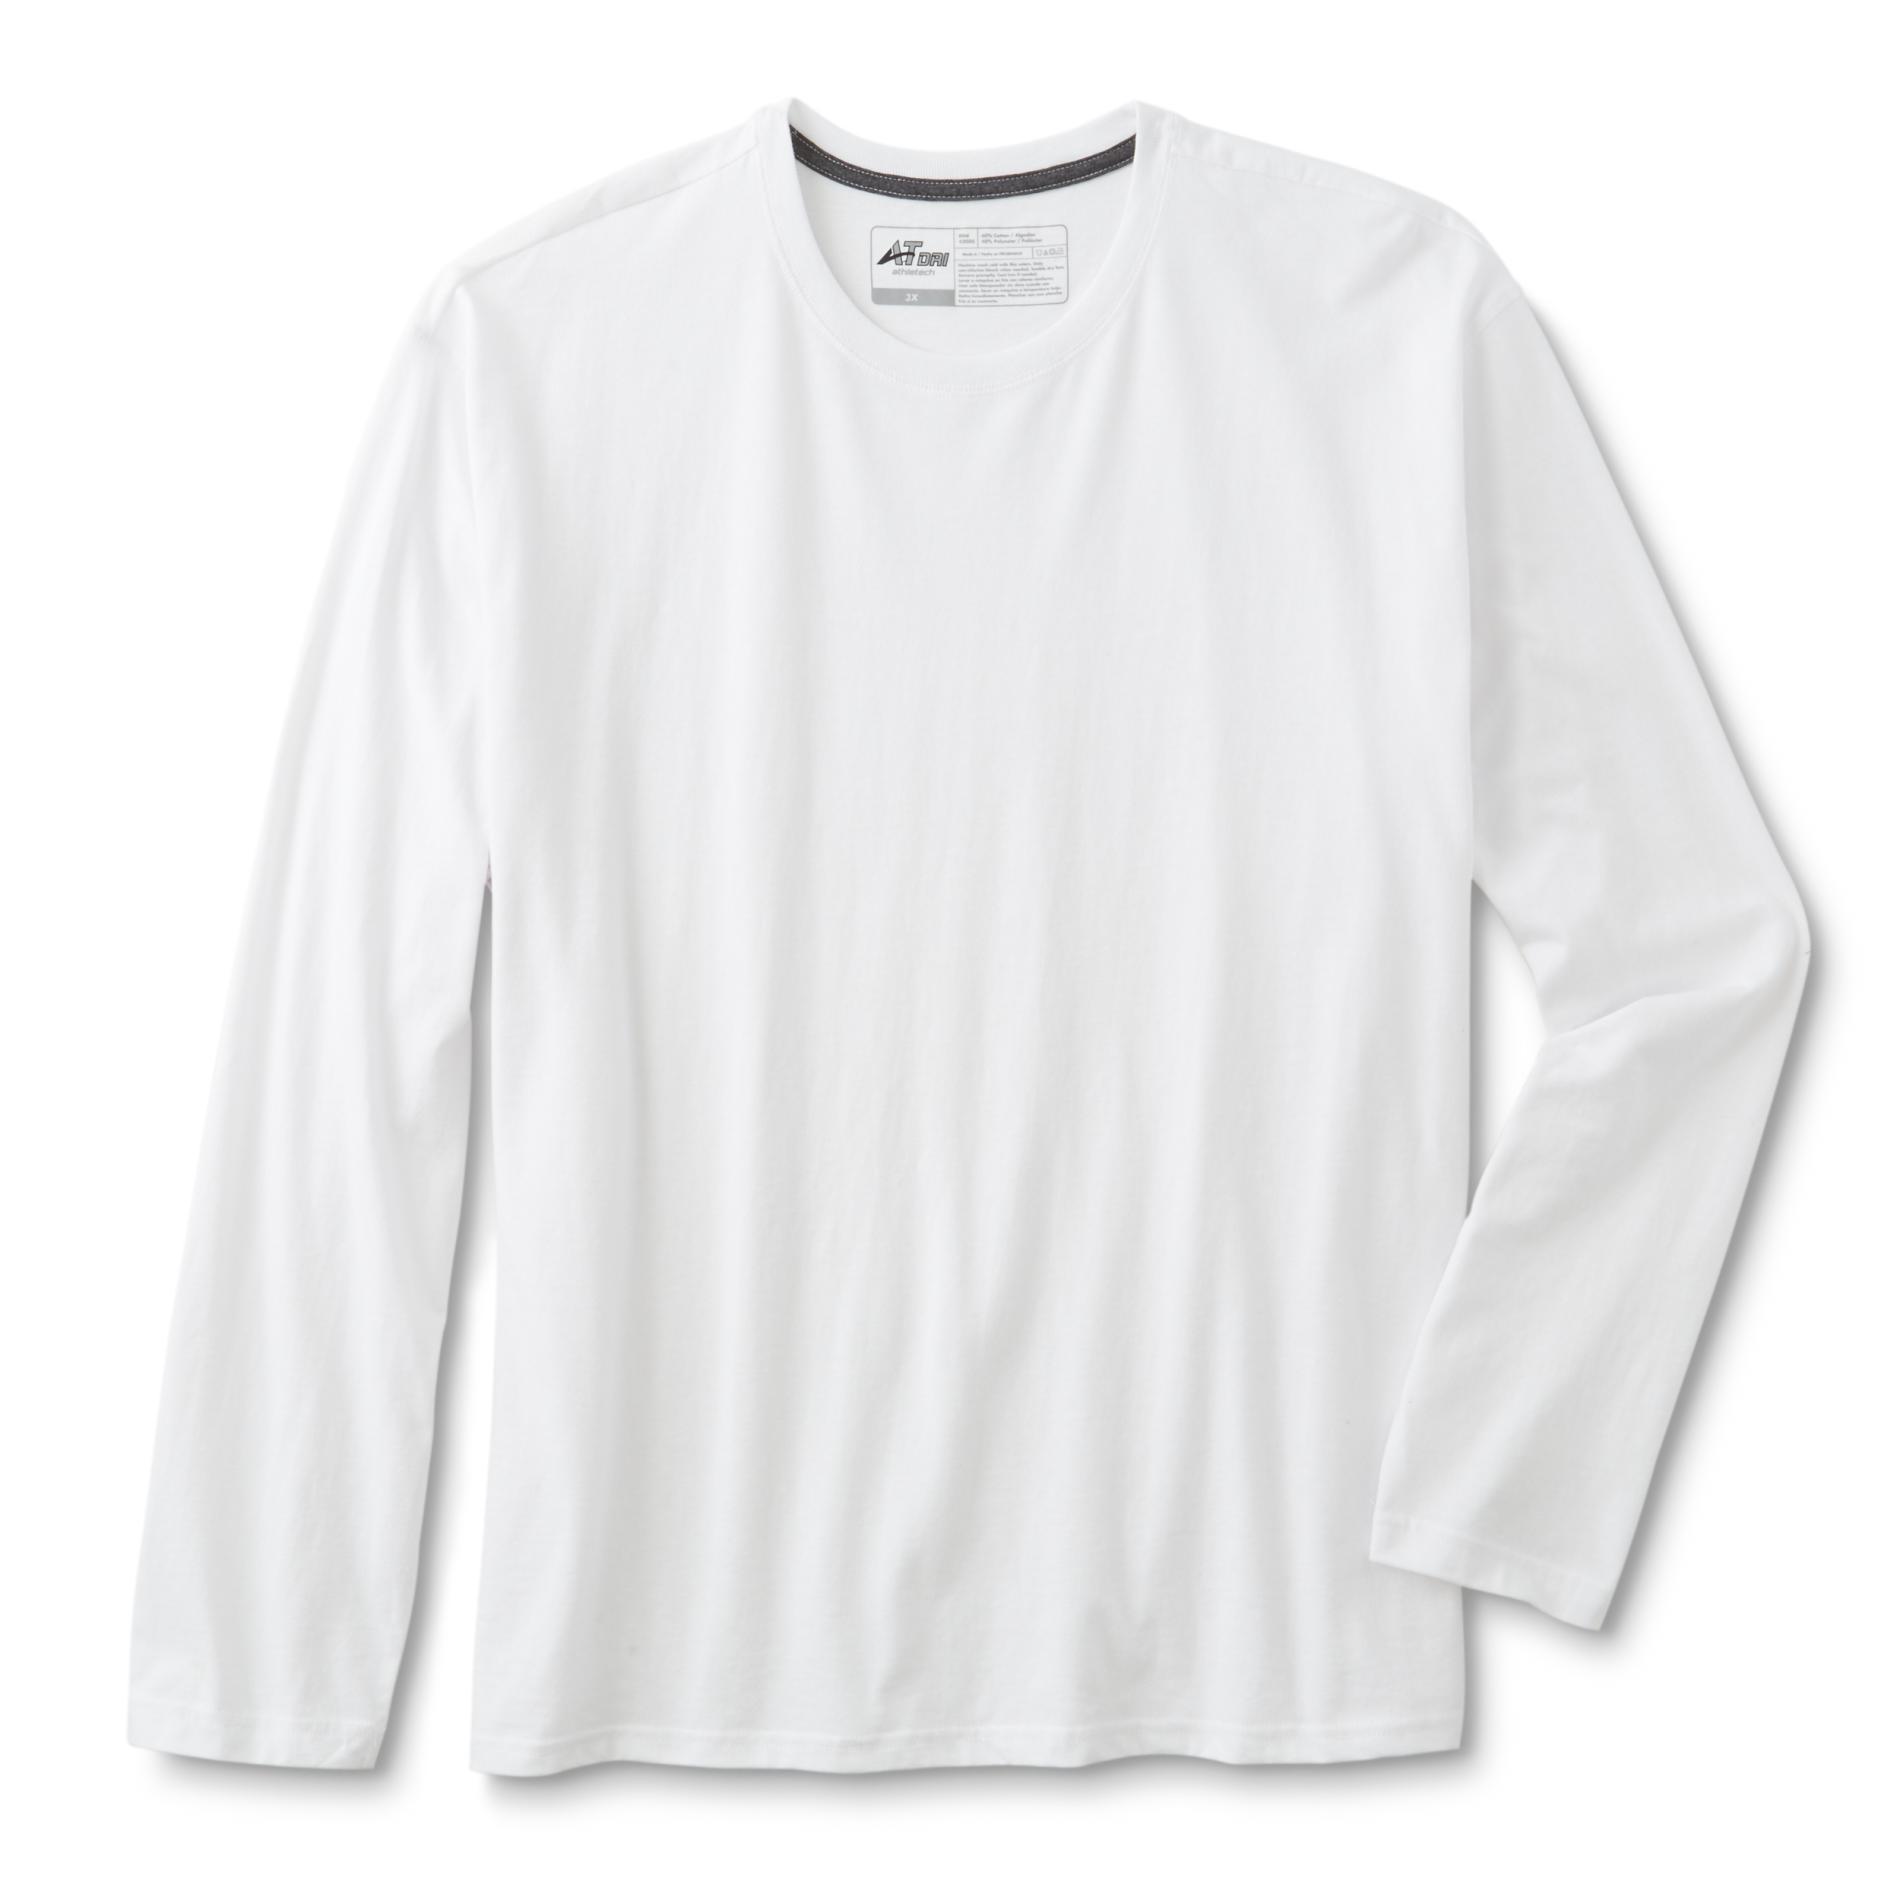 Men's Big & Tall Athletic Shirt